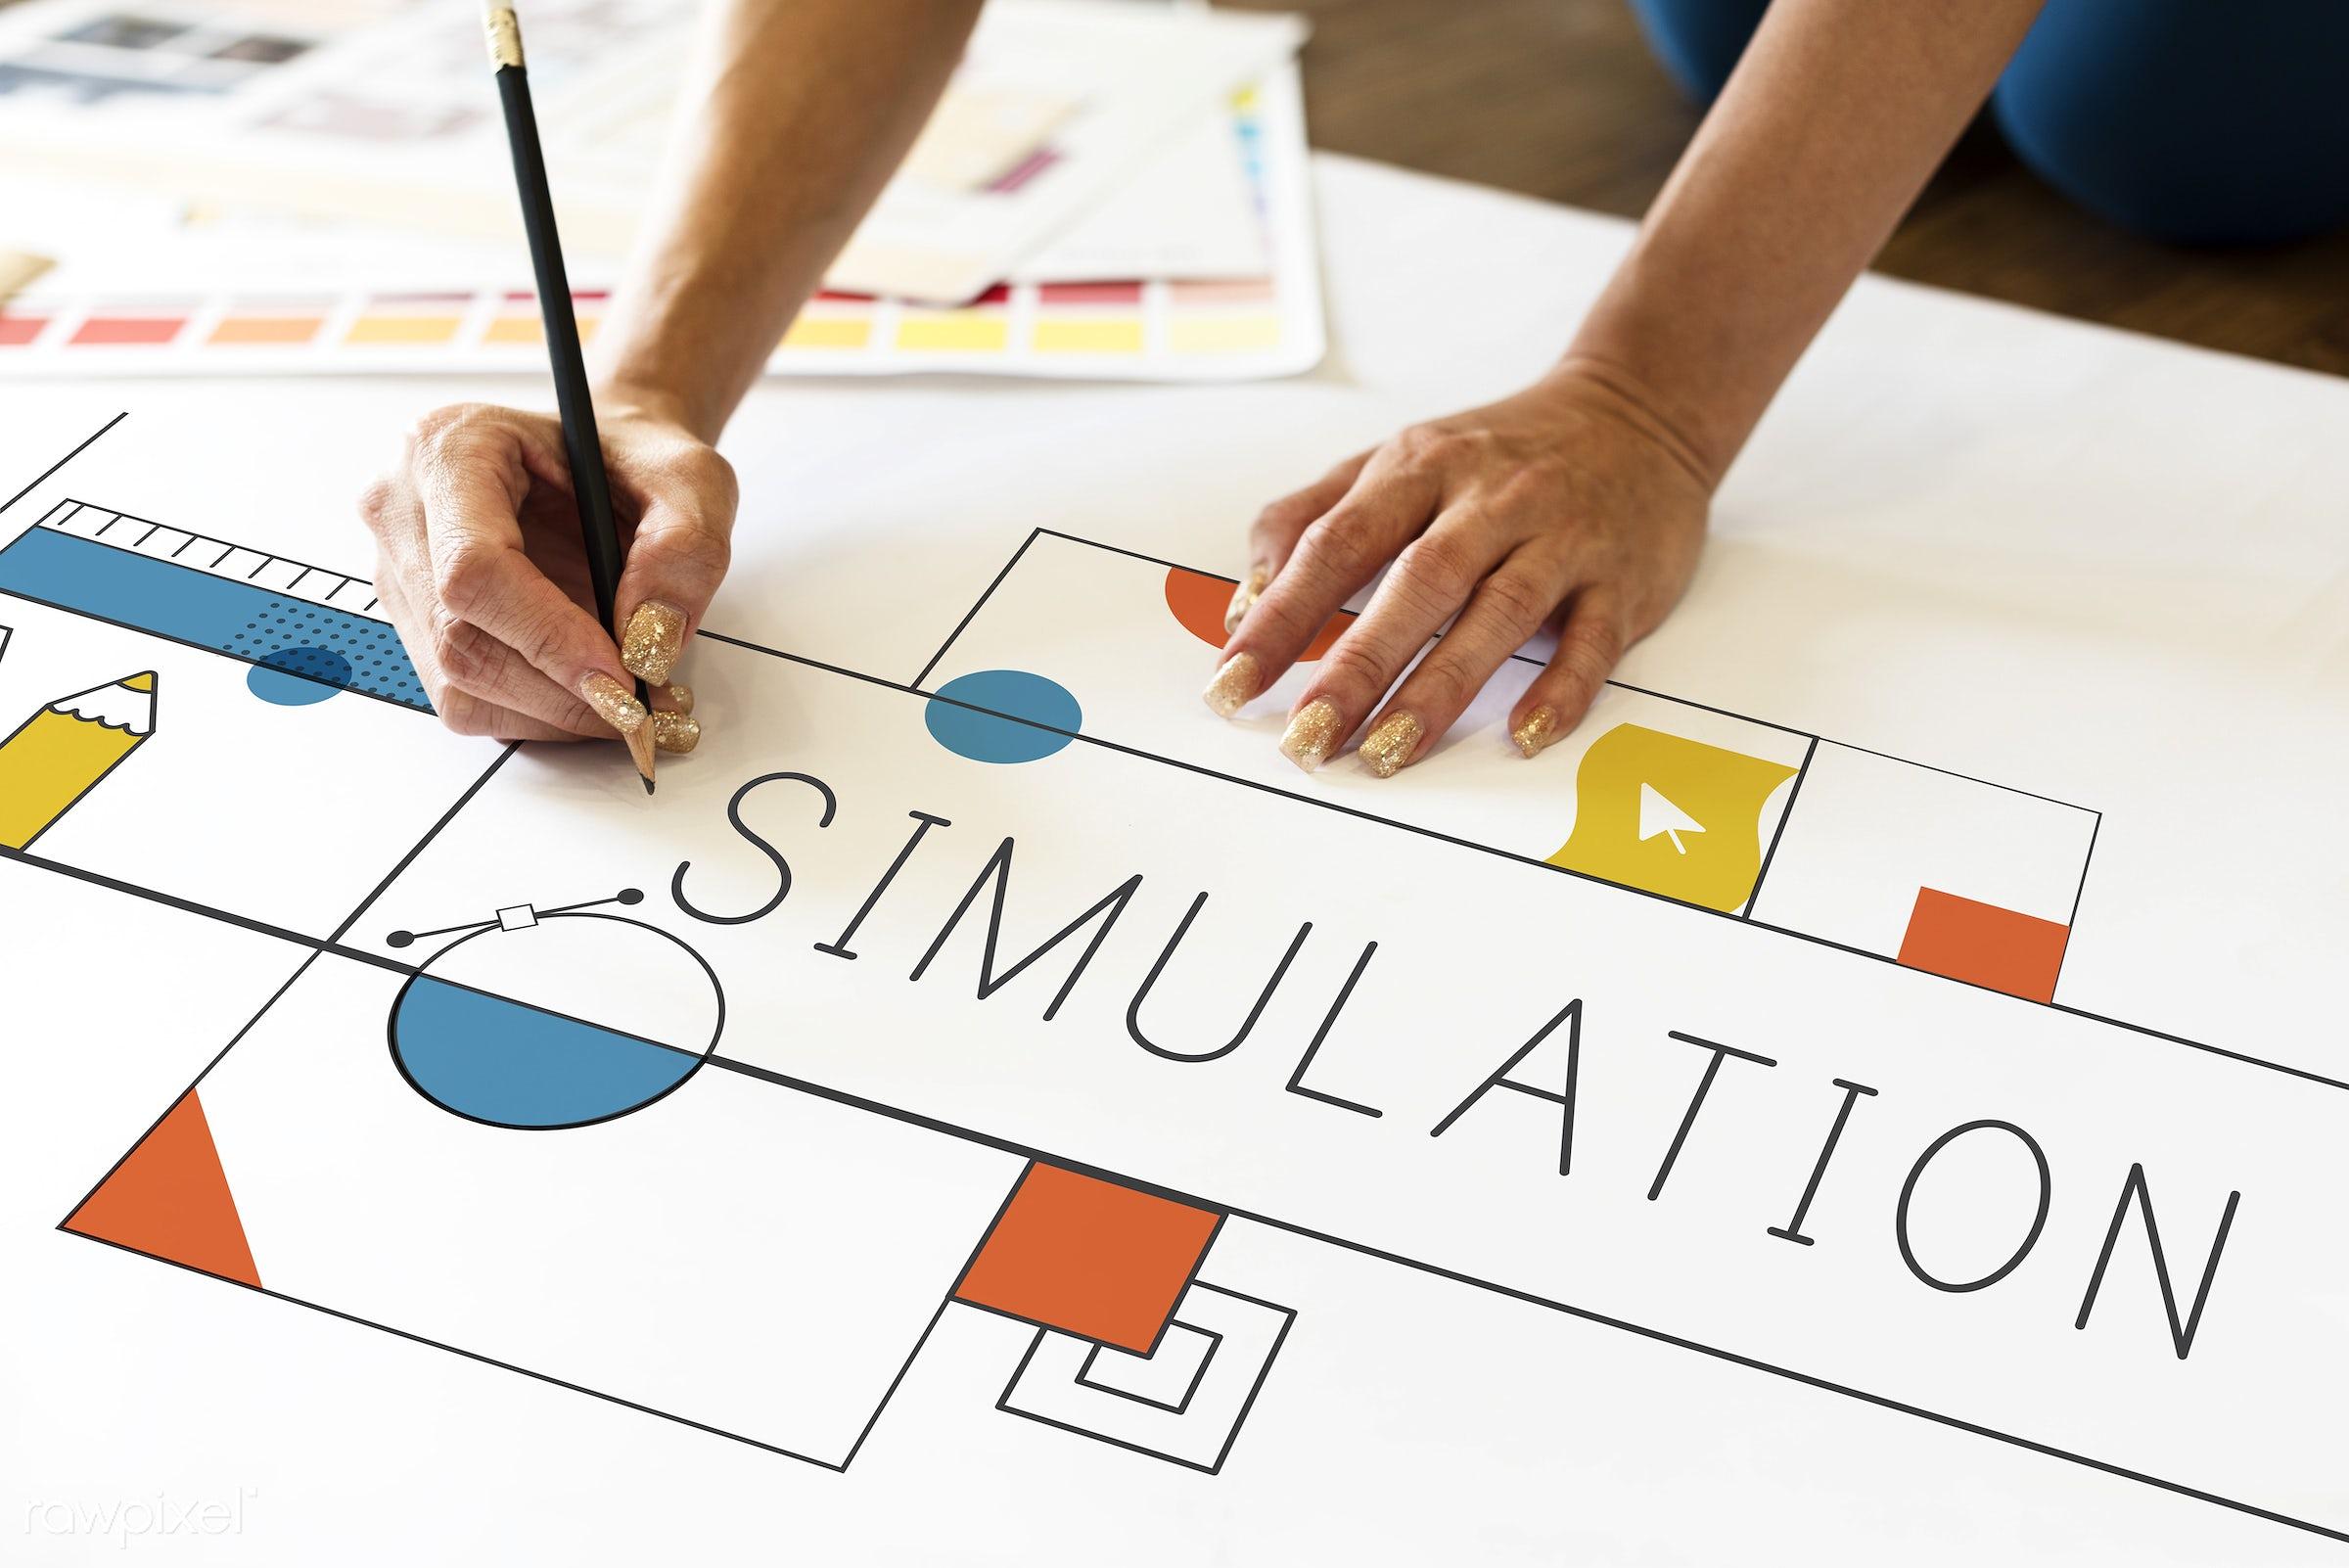 simulation, art, configuration, content, creation, creative, creativity, design, digital, drawing, graphic, graphics, hands...